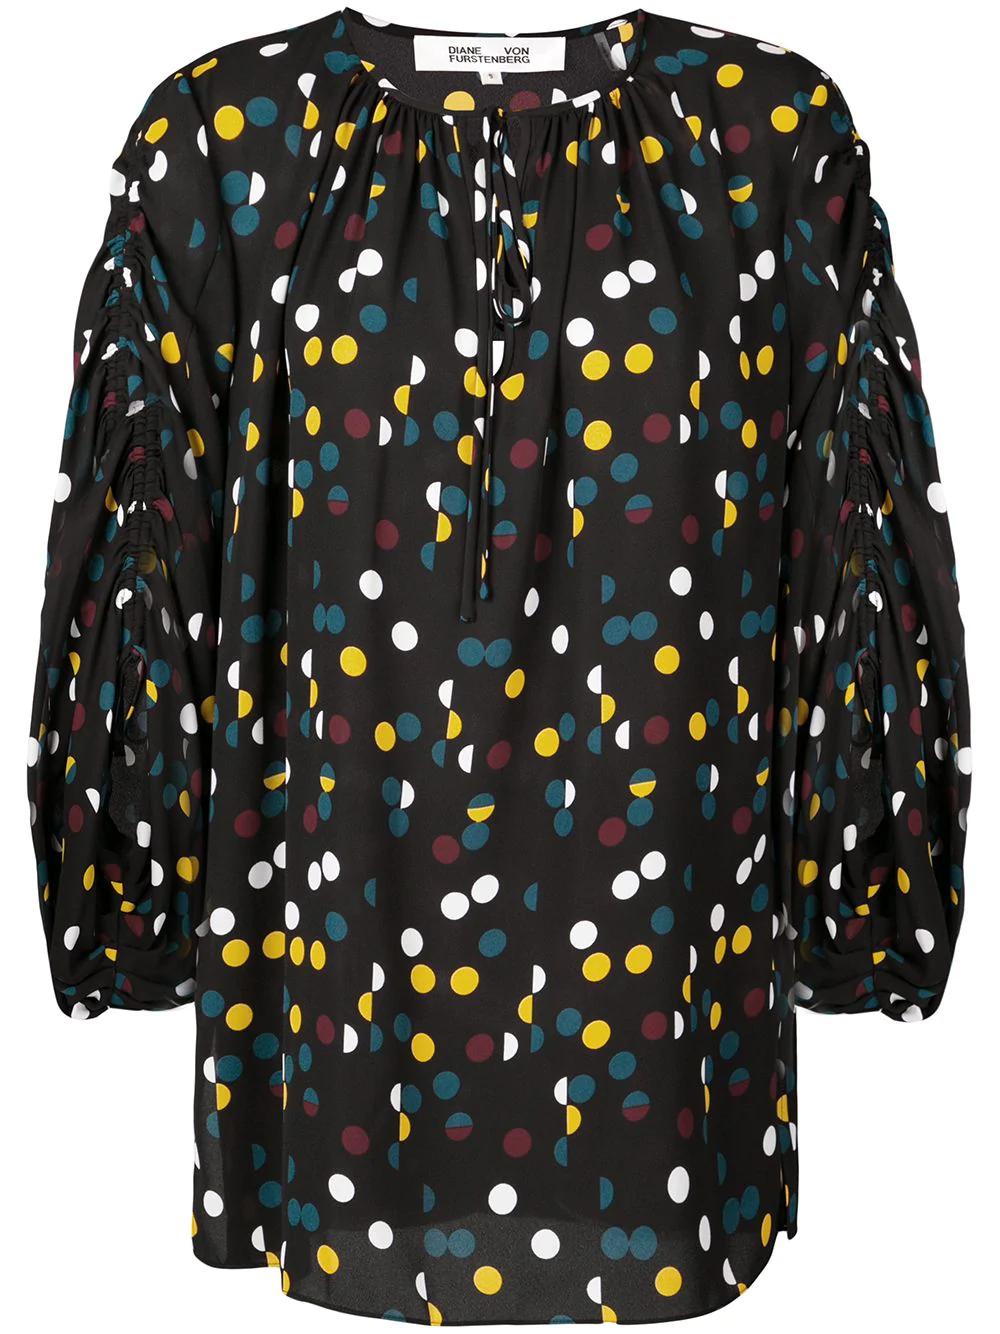 0698a9121f8317 Diane Von Furstenberg Dvf Polka Dot Blouse - Black   ModeSens